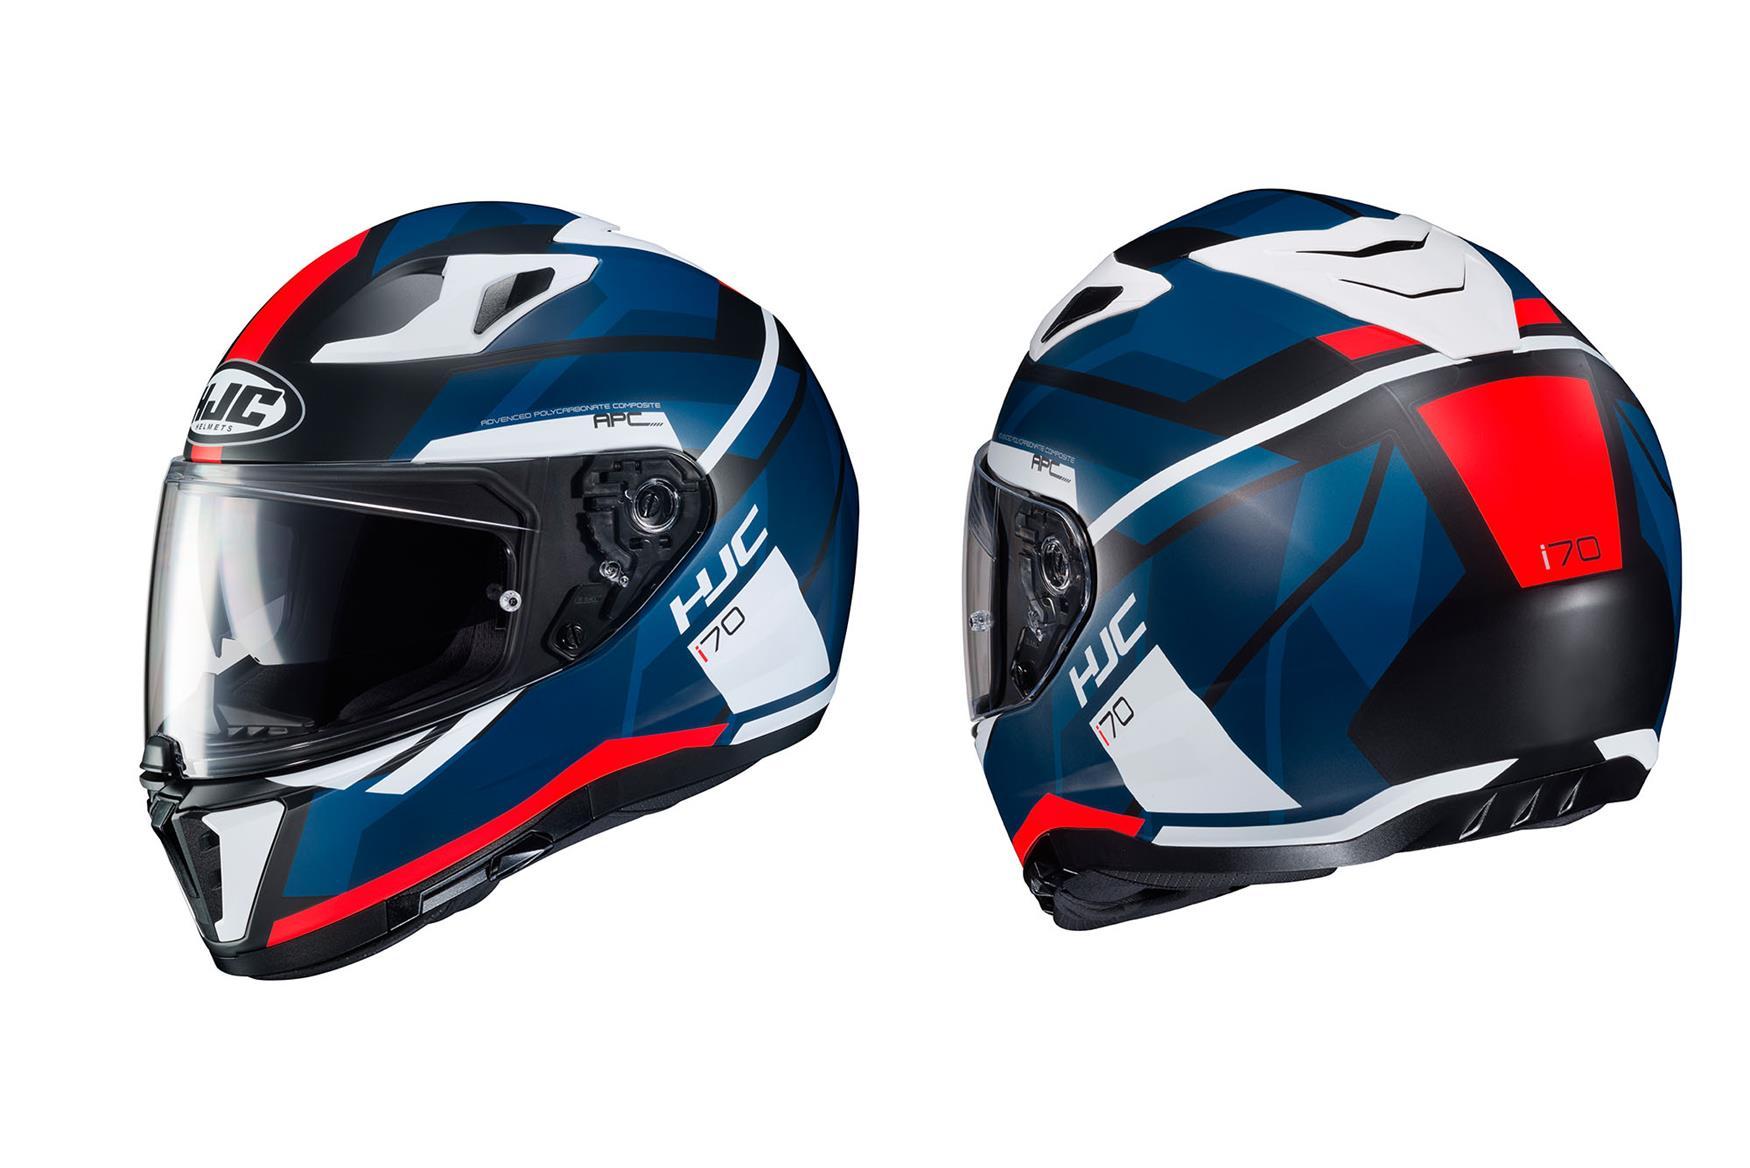 HJC i70 helmet